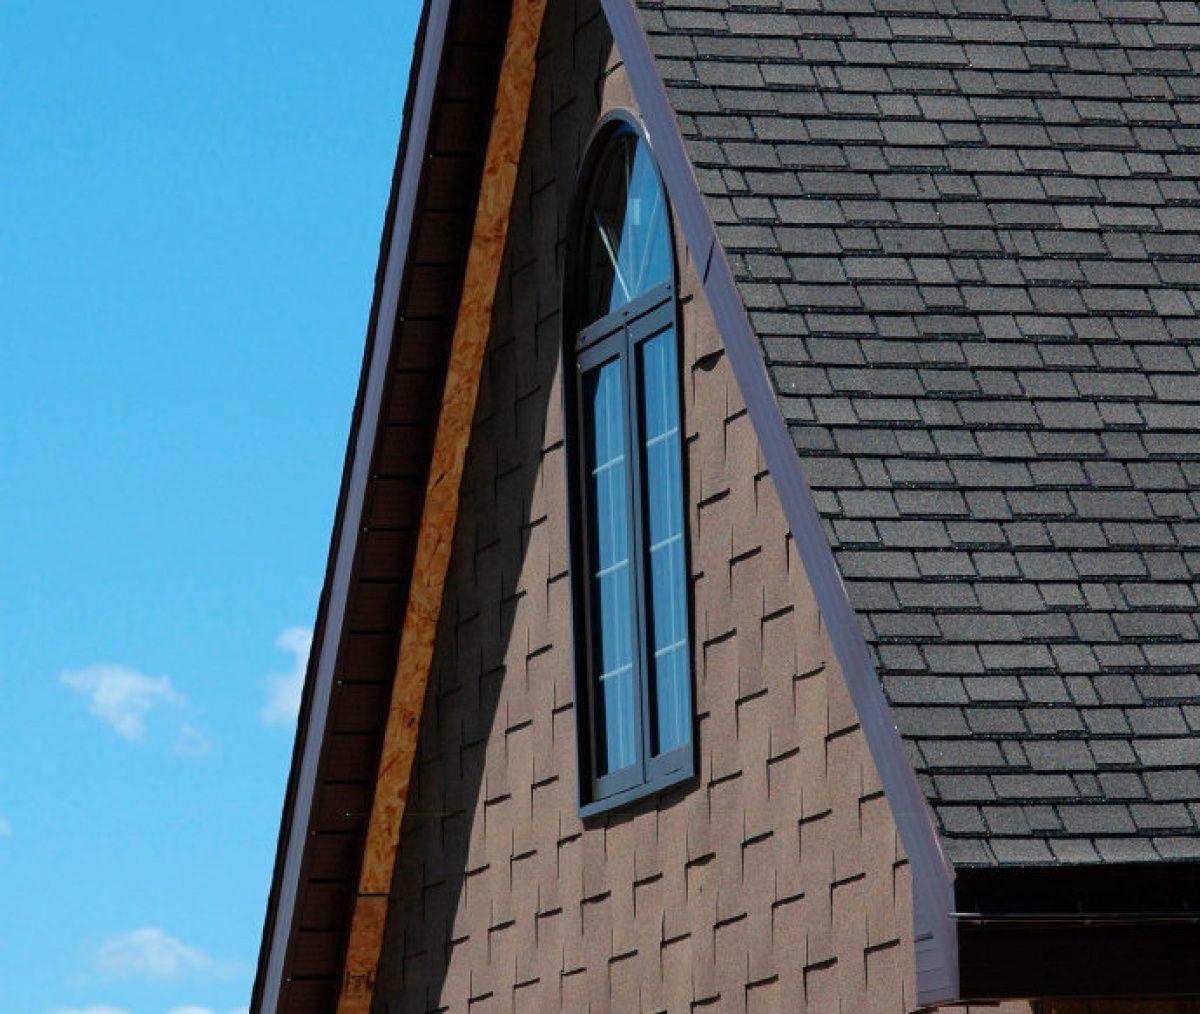 Interlocking shingles are simple, attractive wall siding